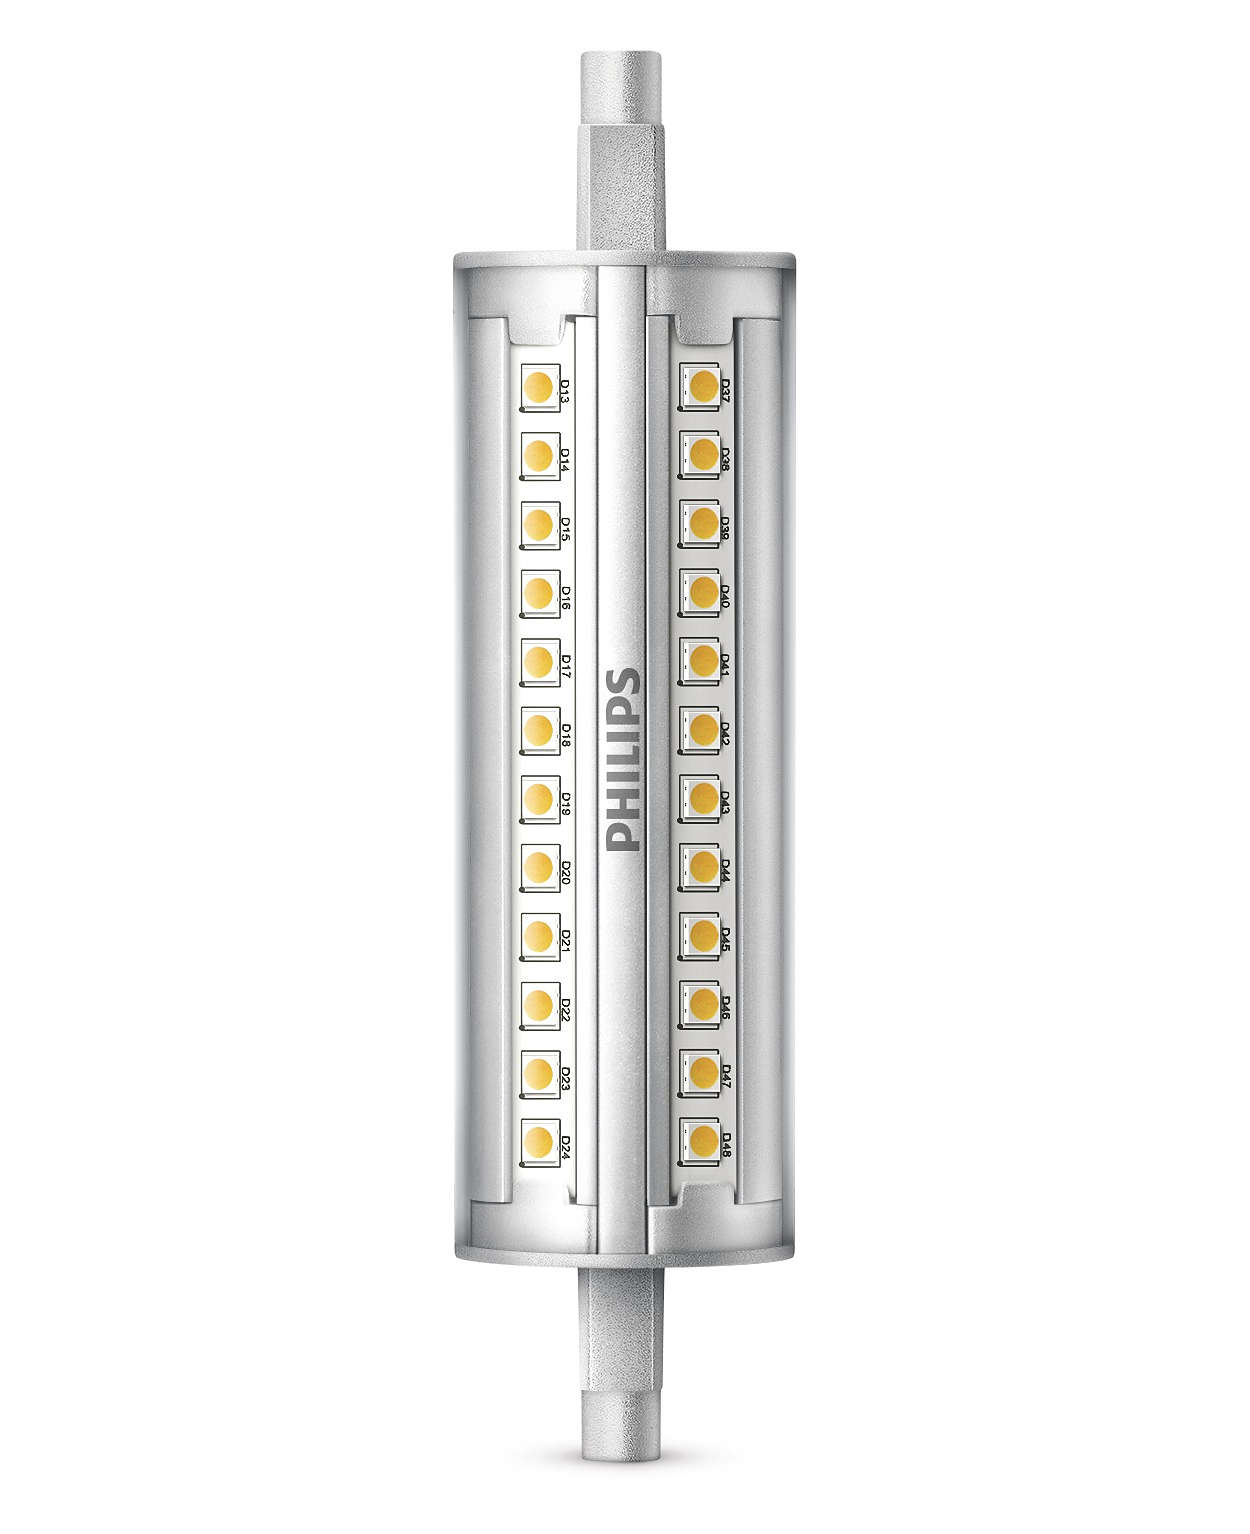 Dimmbares lineares LED-Licht mit einem 300-Grad-Strahl